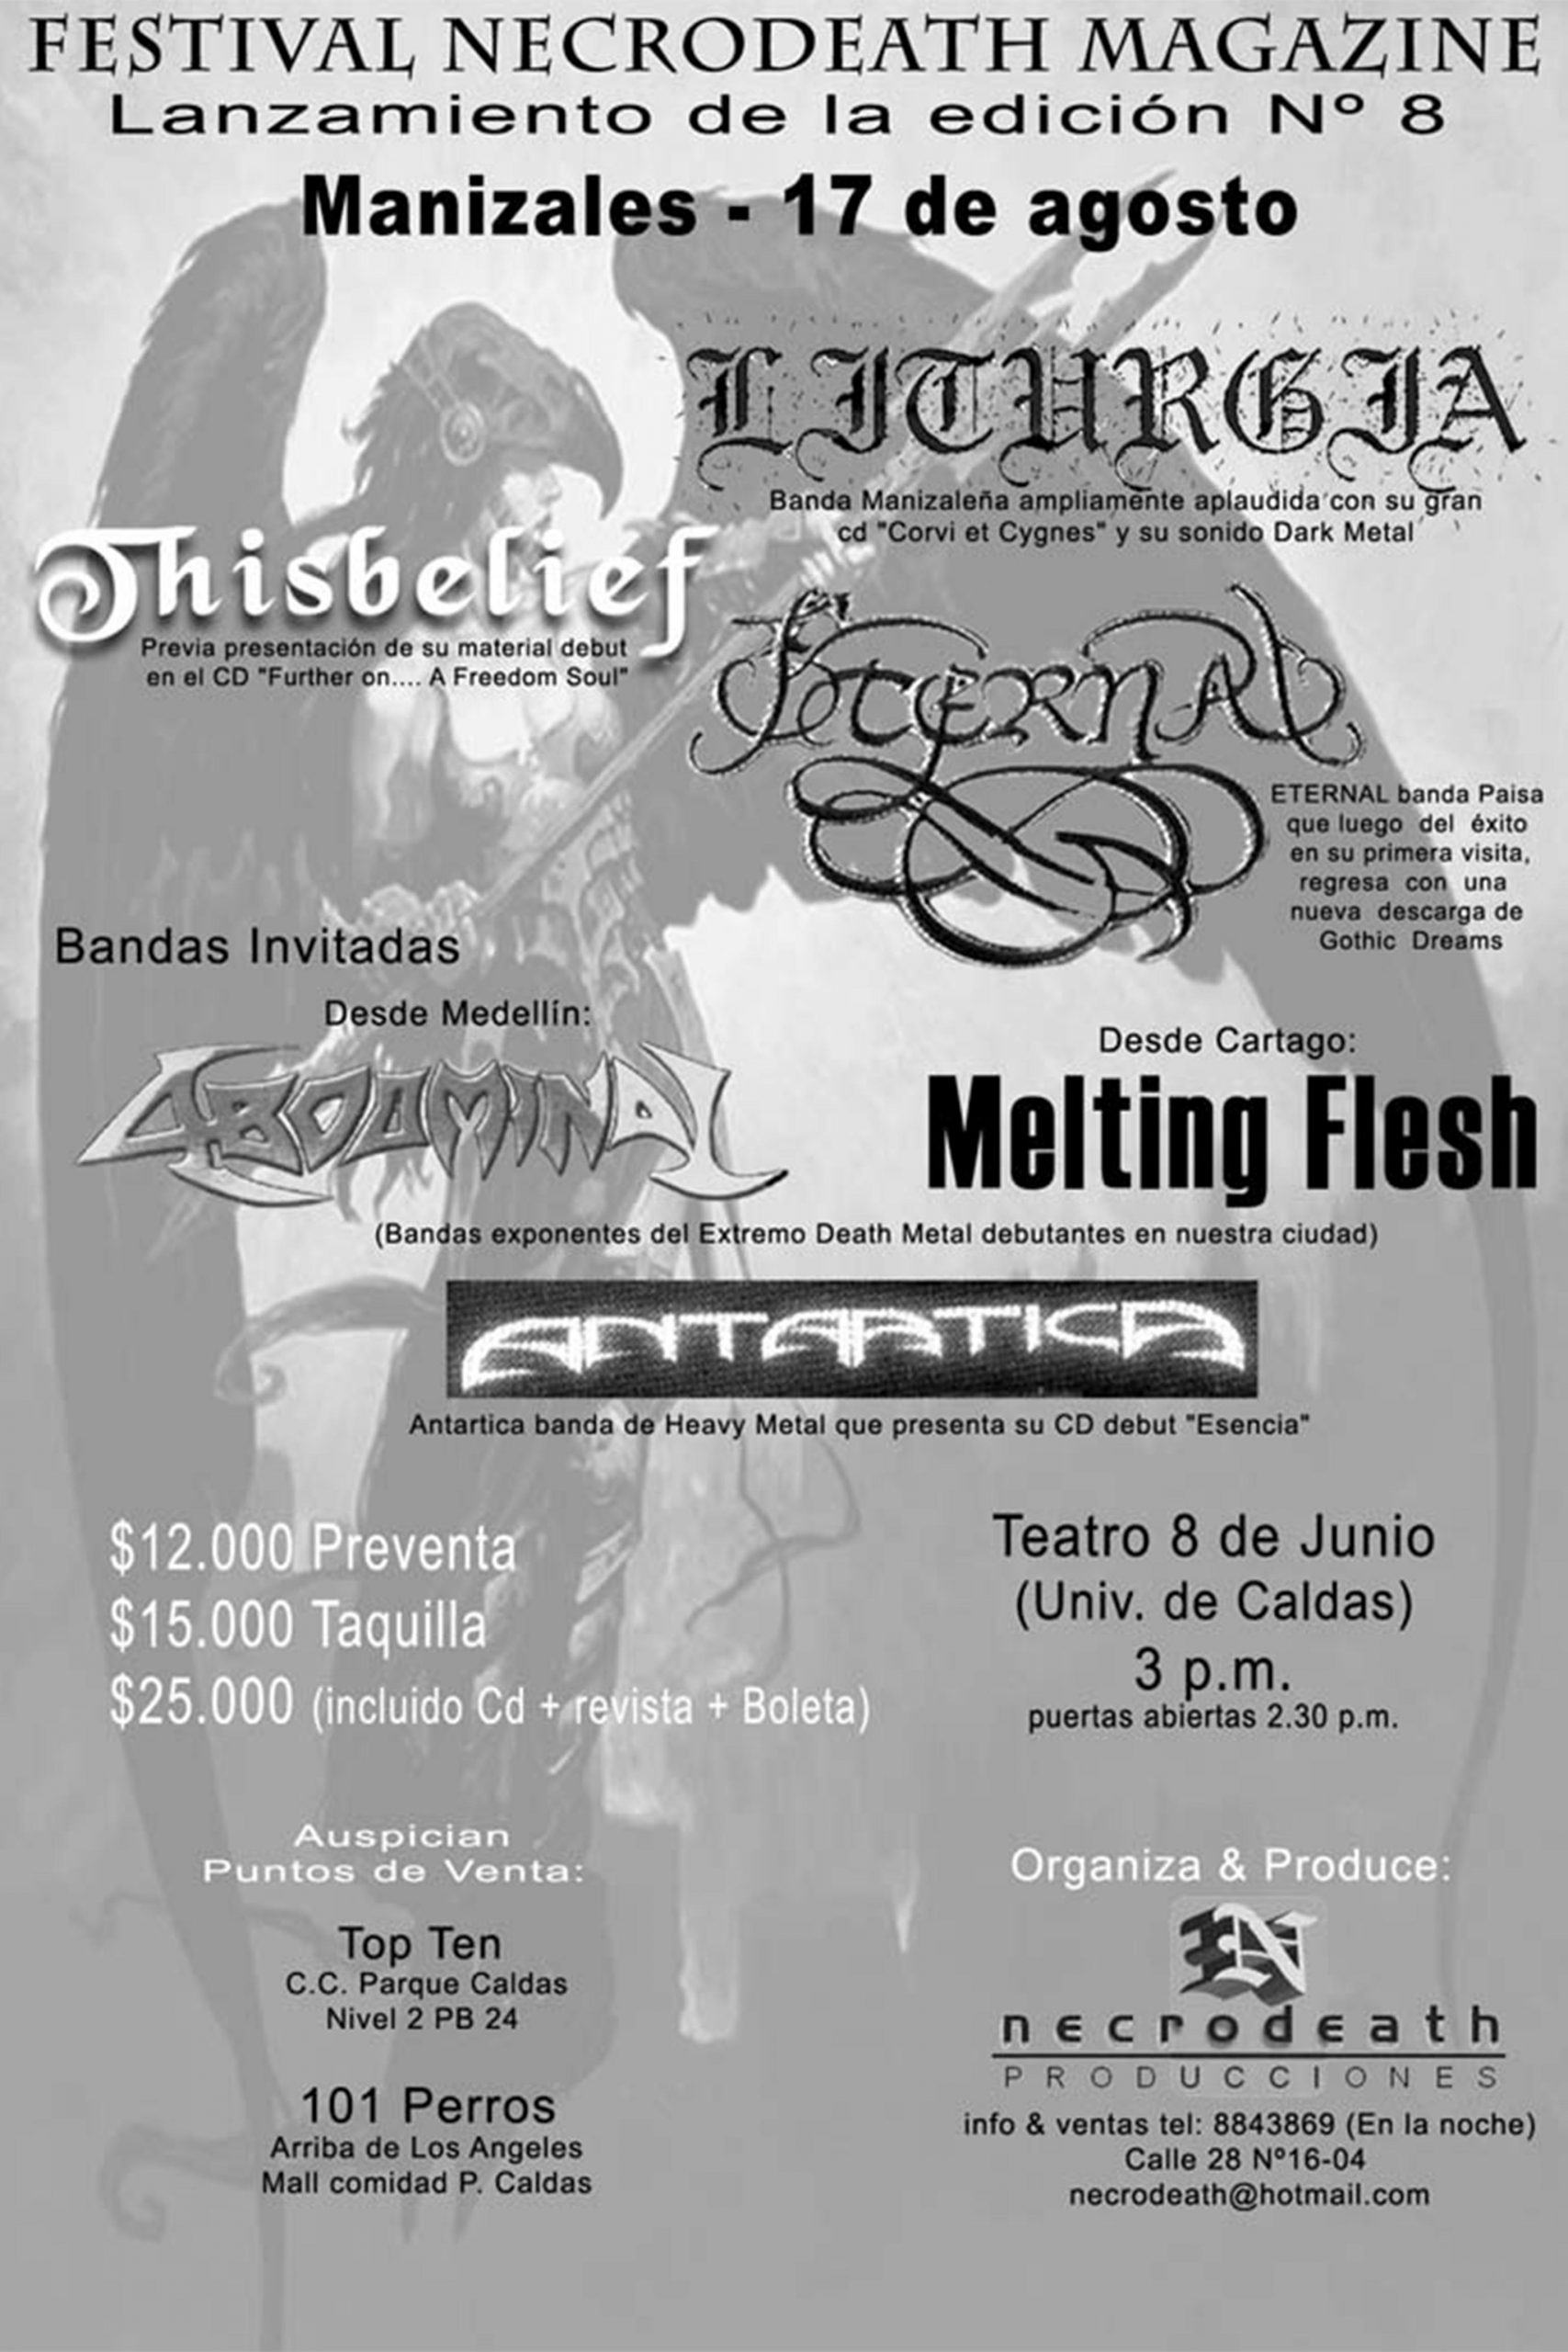 Festival necrodeath